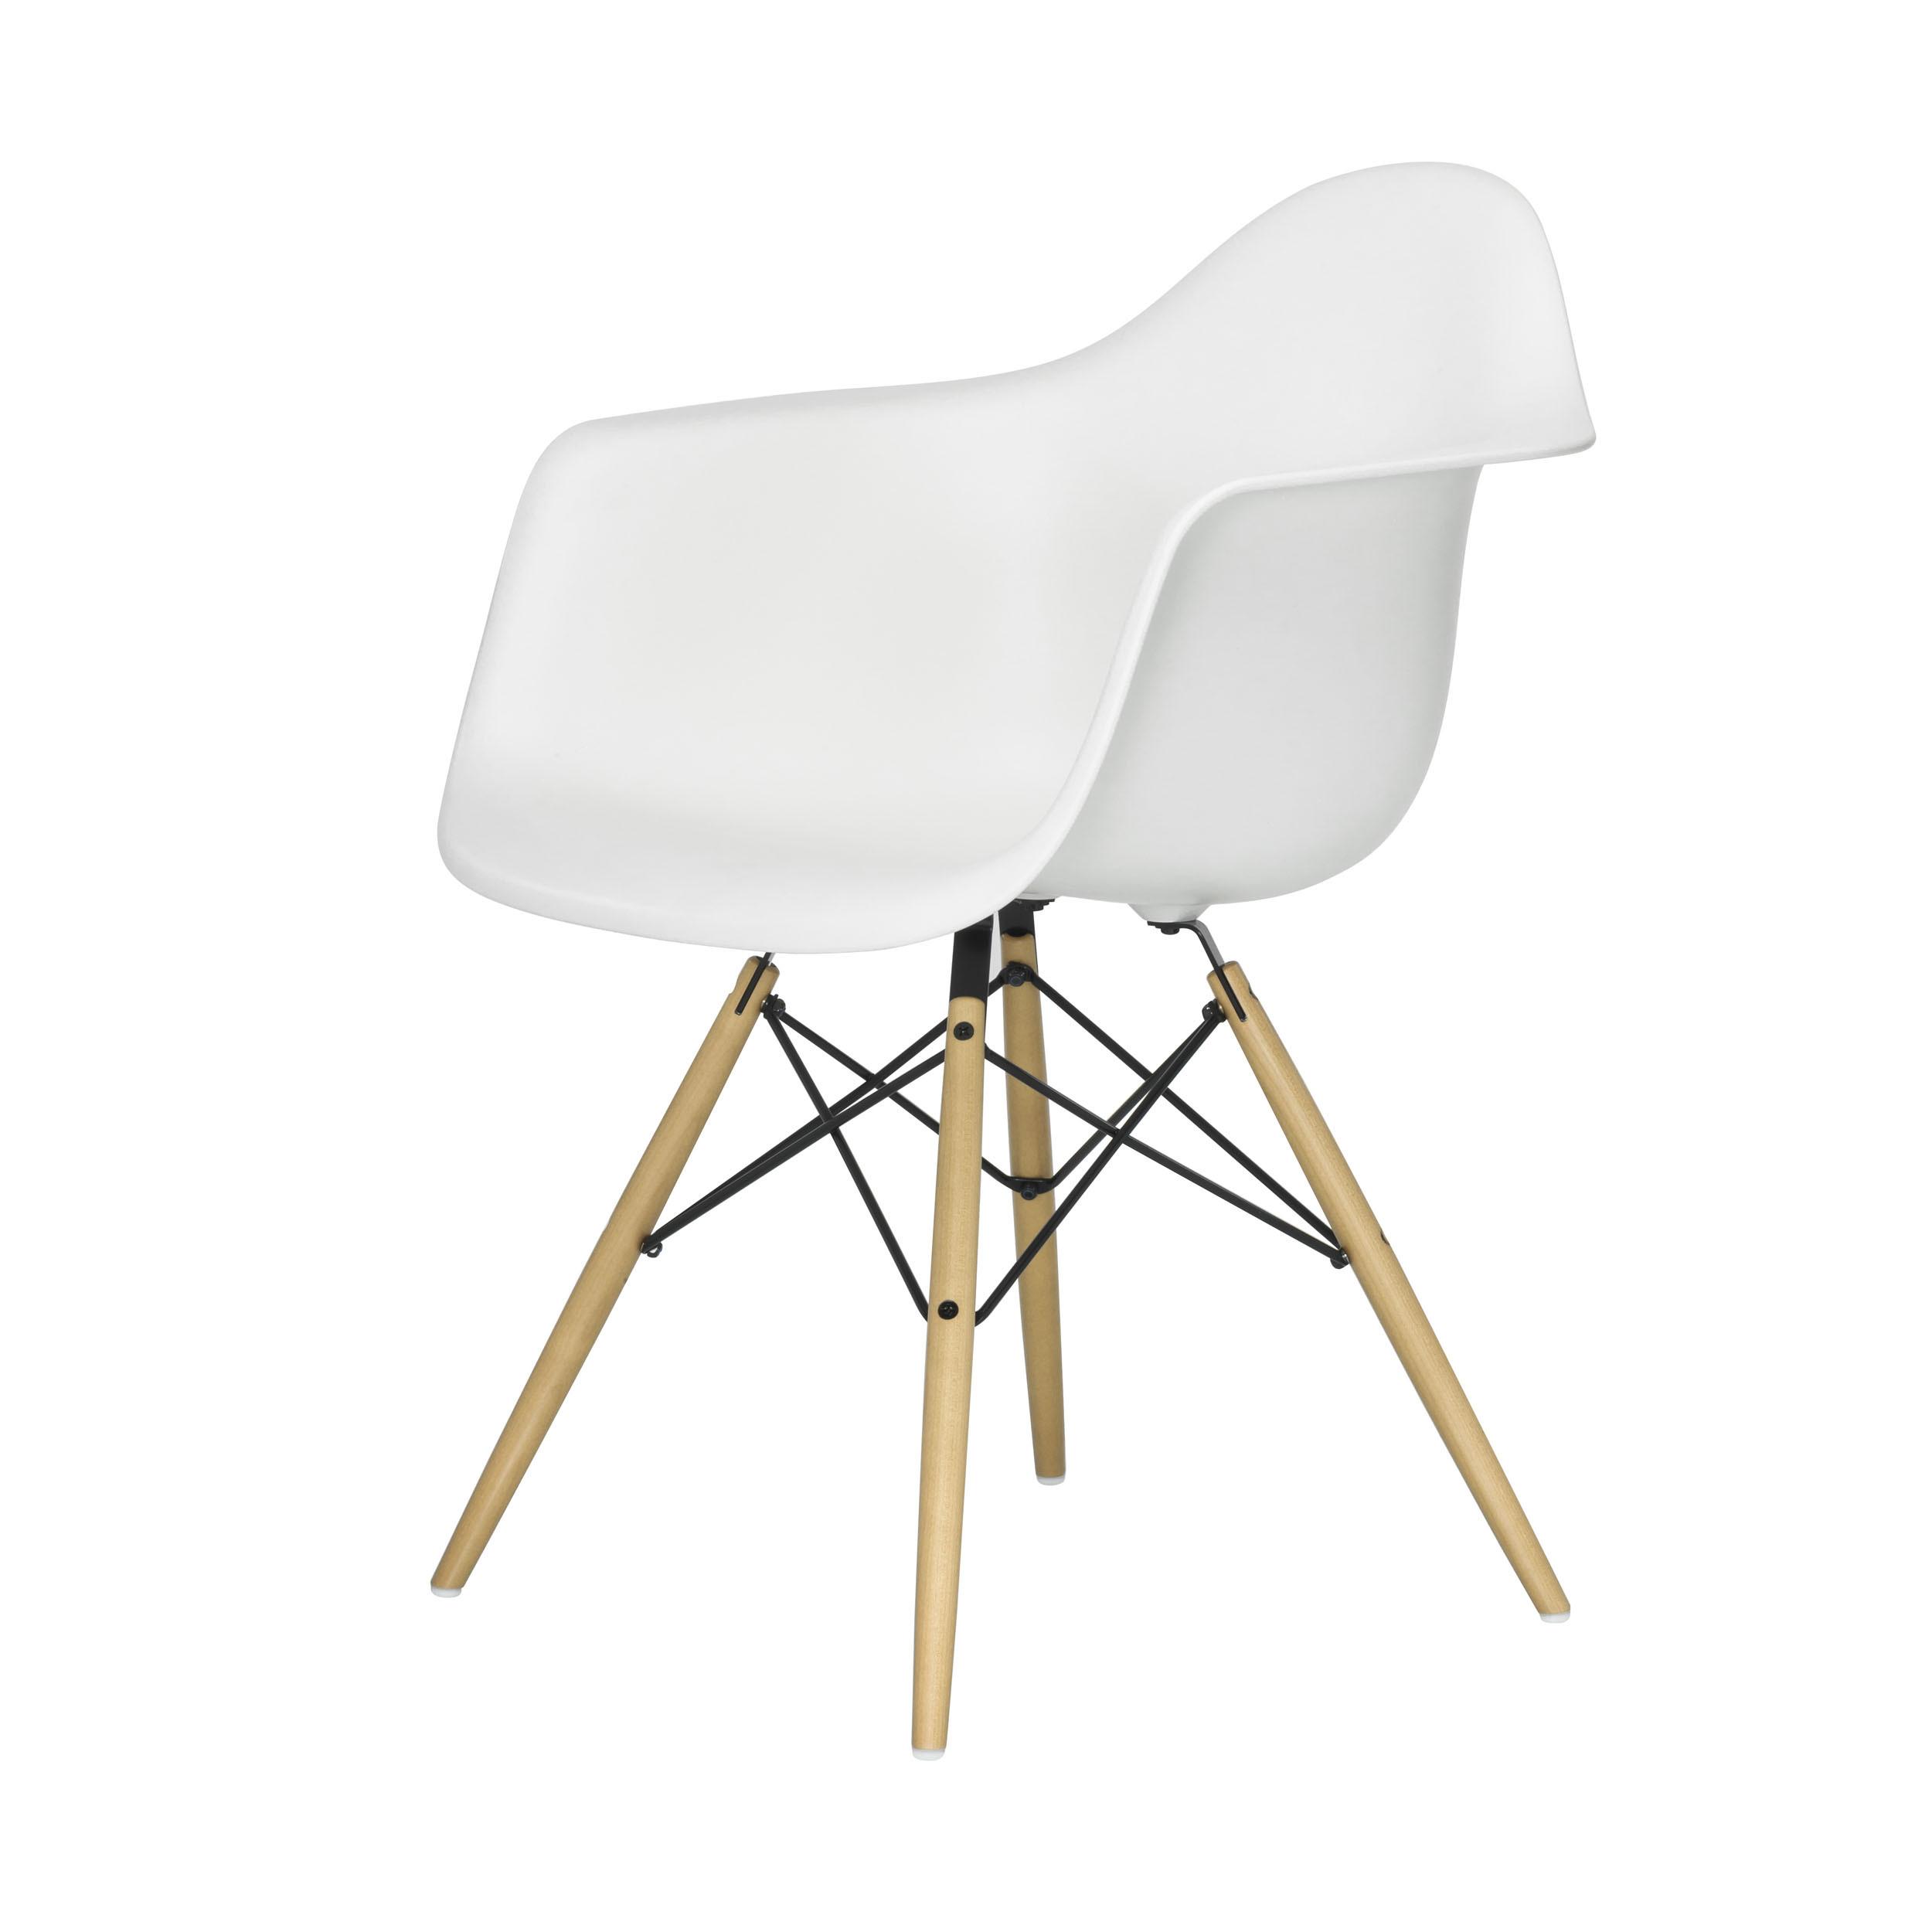 eames plastic armchair stuhl daw mit kunststoffgleitern weiss ahorn neue ma e. Black Bedroom Furniture Sets. Home Design Ideas